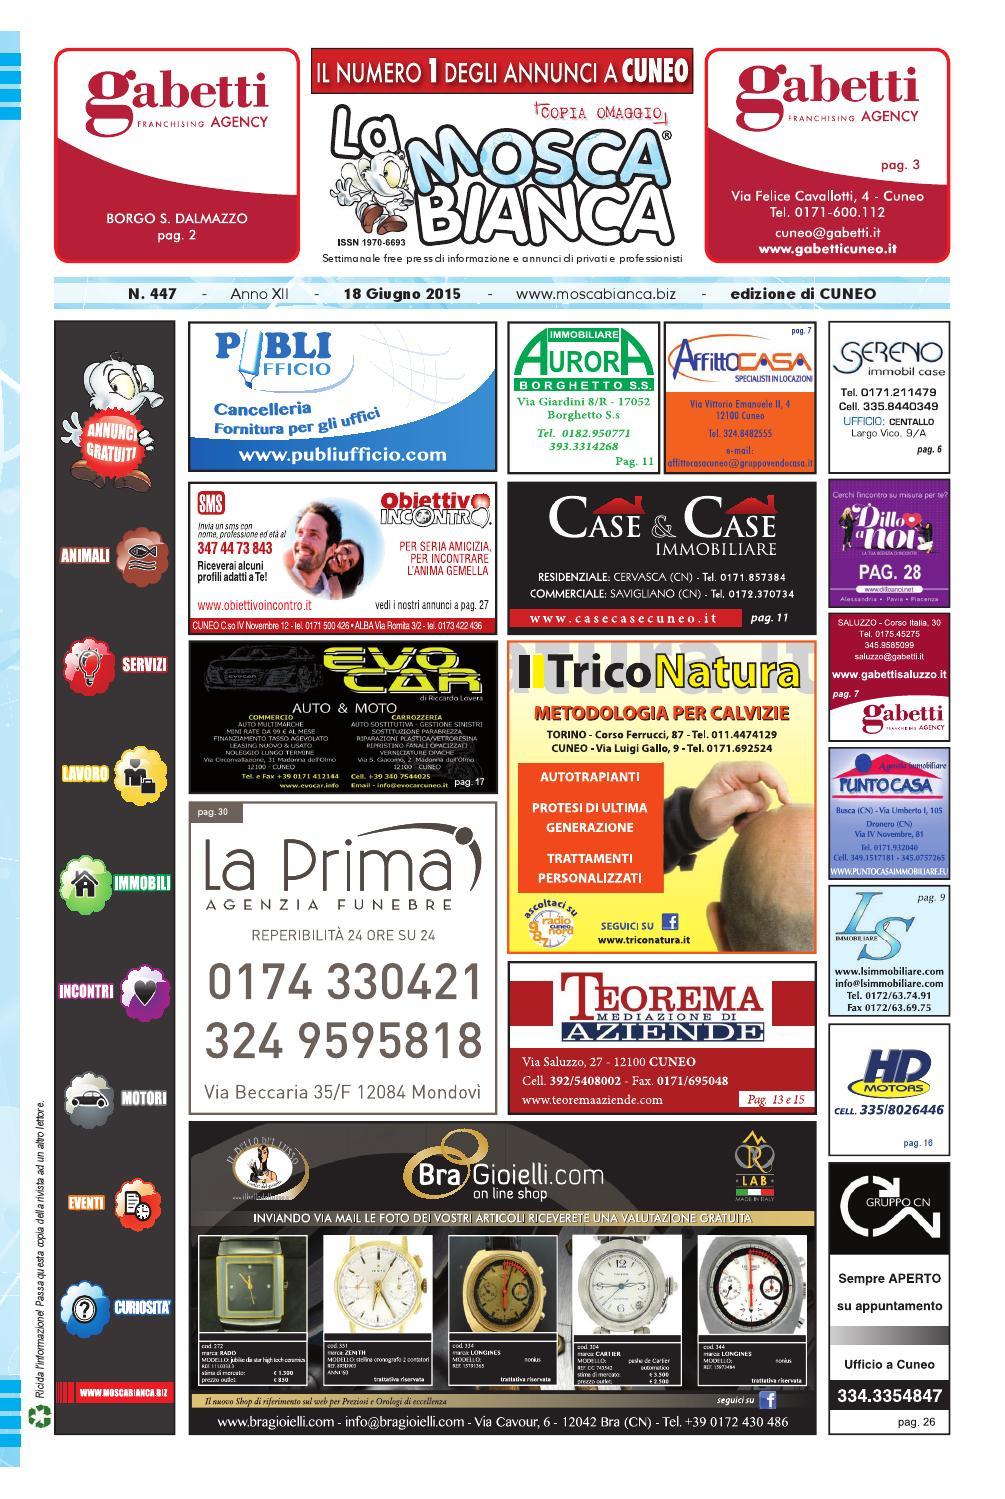 S Mosca Publidok lIssuu Cuneo N447 r By La Bianca H2YED9WI